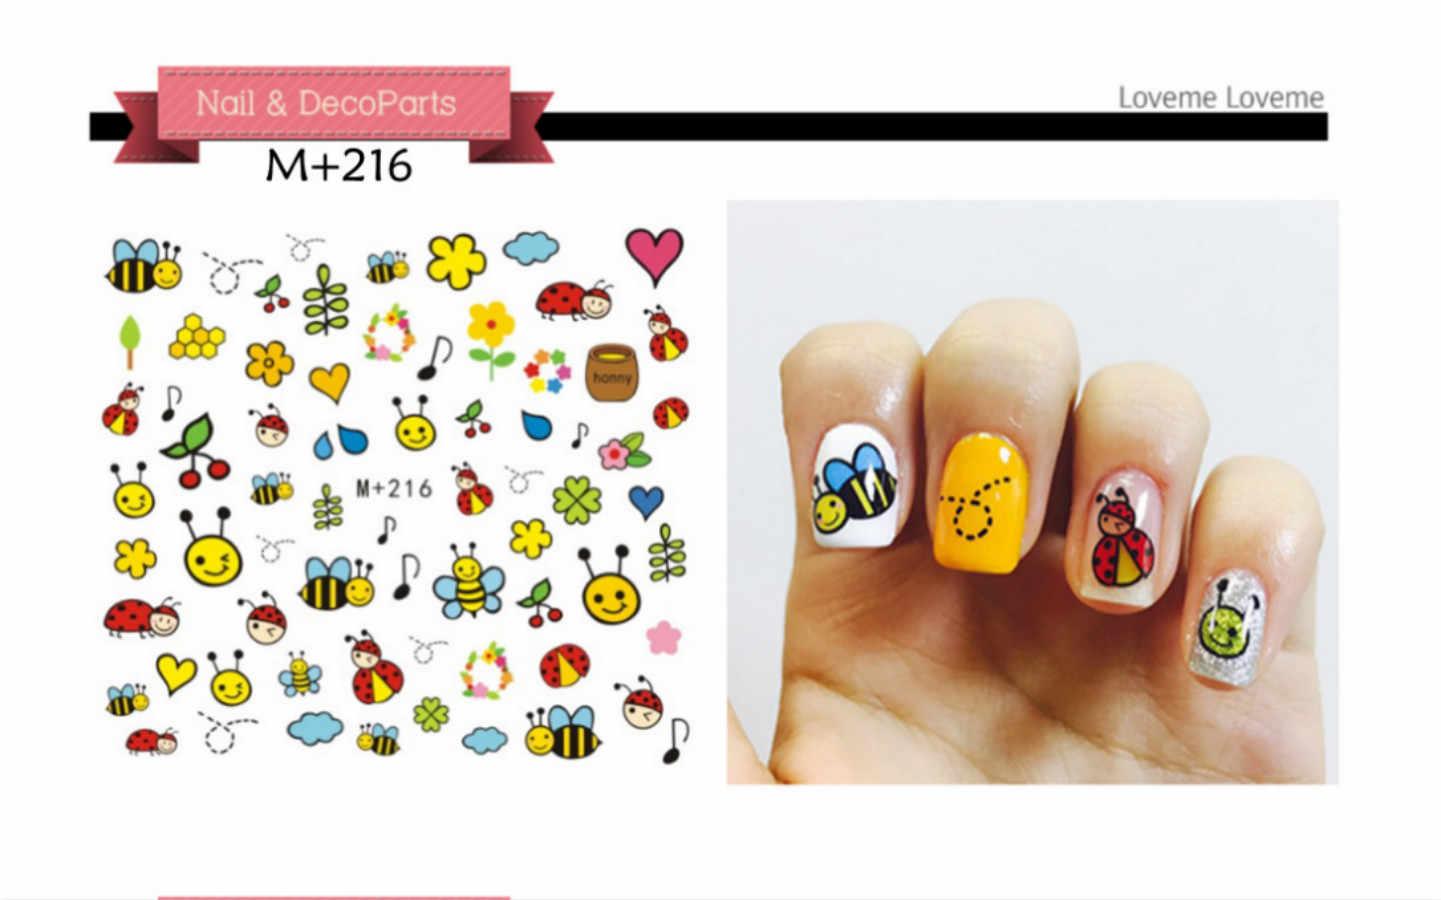 Bees Ladybugs สติกเกอร์เล็บดอกไม้ผีเสื้อรูปลอก Sliders สำหรับตกแต่งเล็บ Tattoo Manicure Wraps เครื่องมือเคล็ดลับ